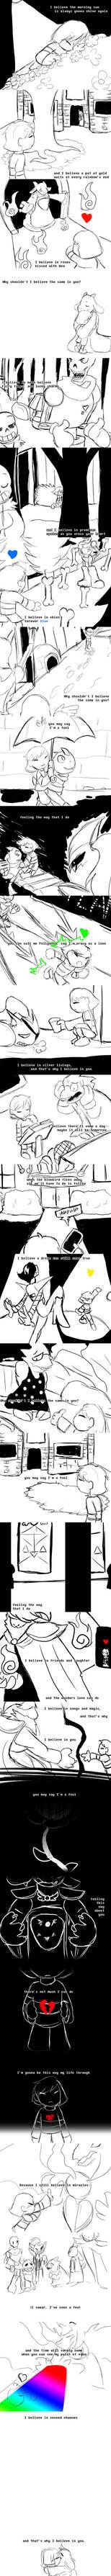 [f] I Believe In U[ndertale]